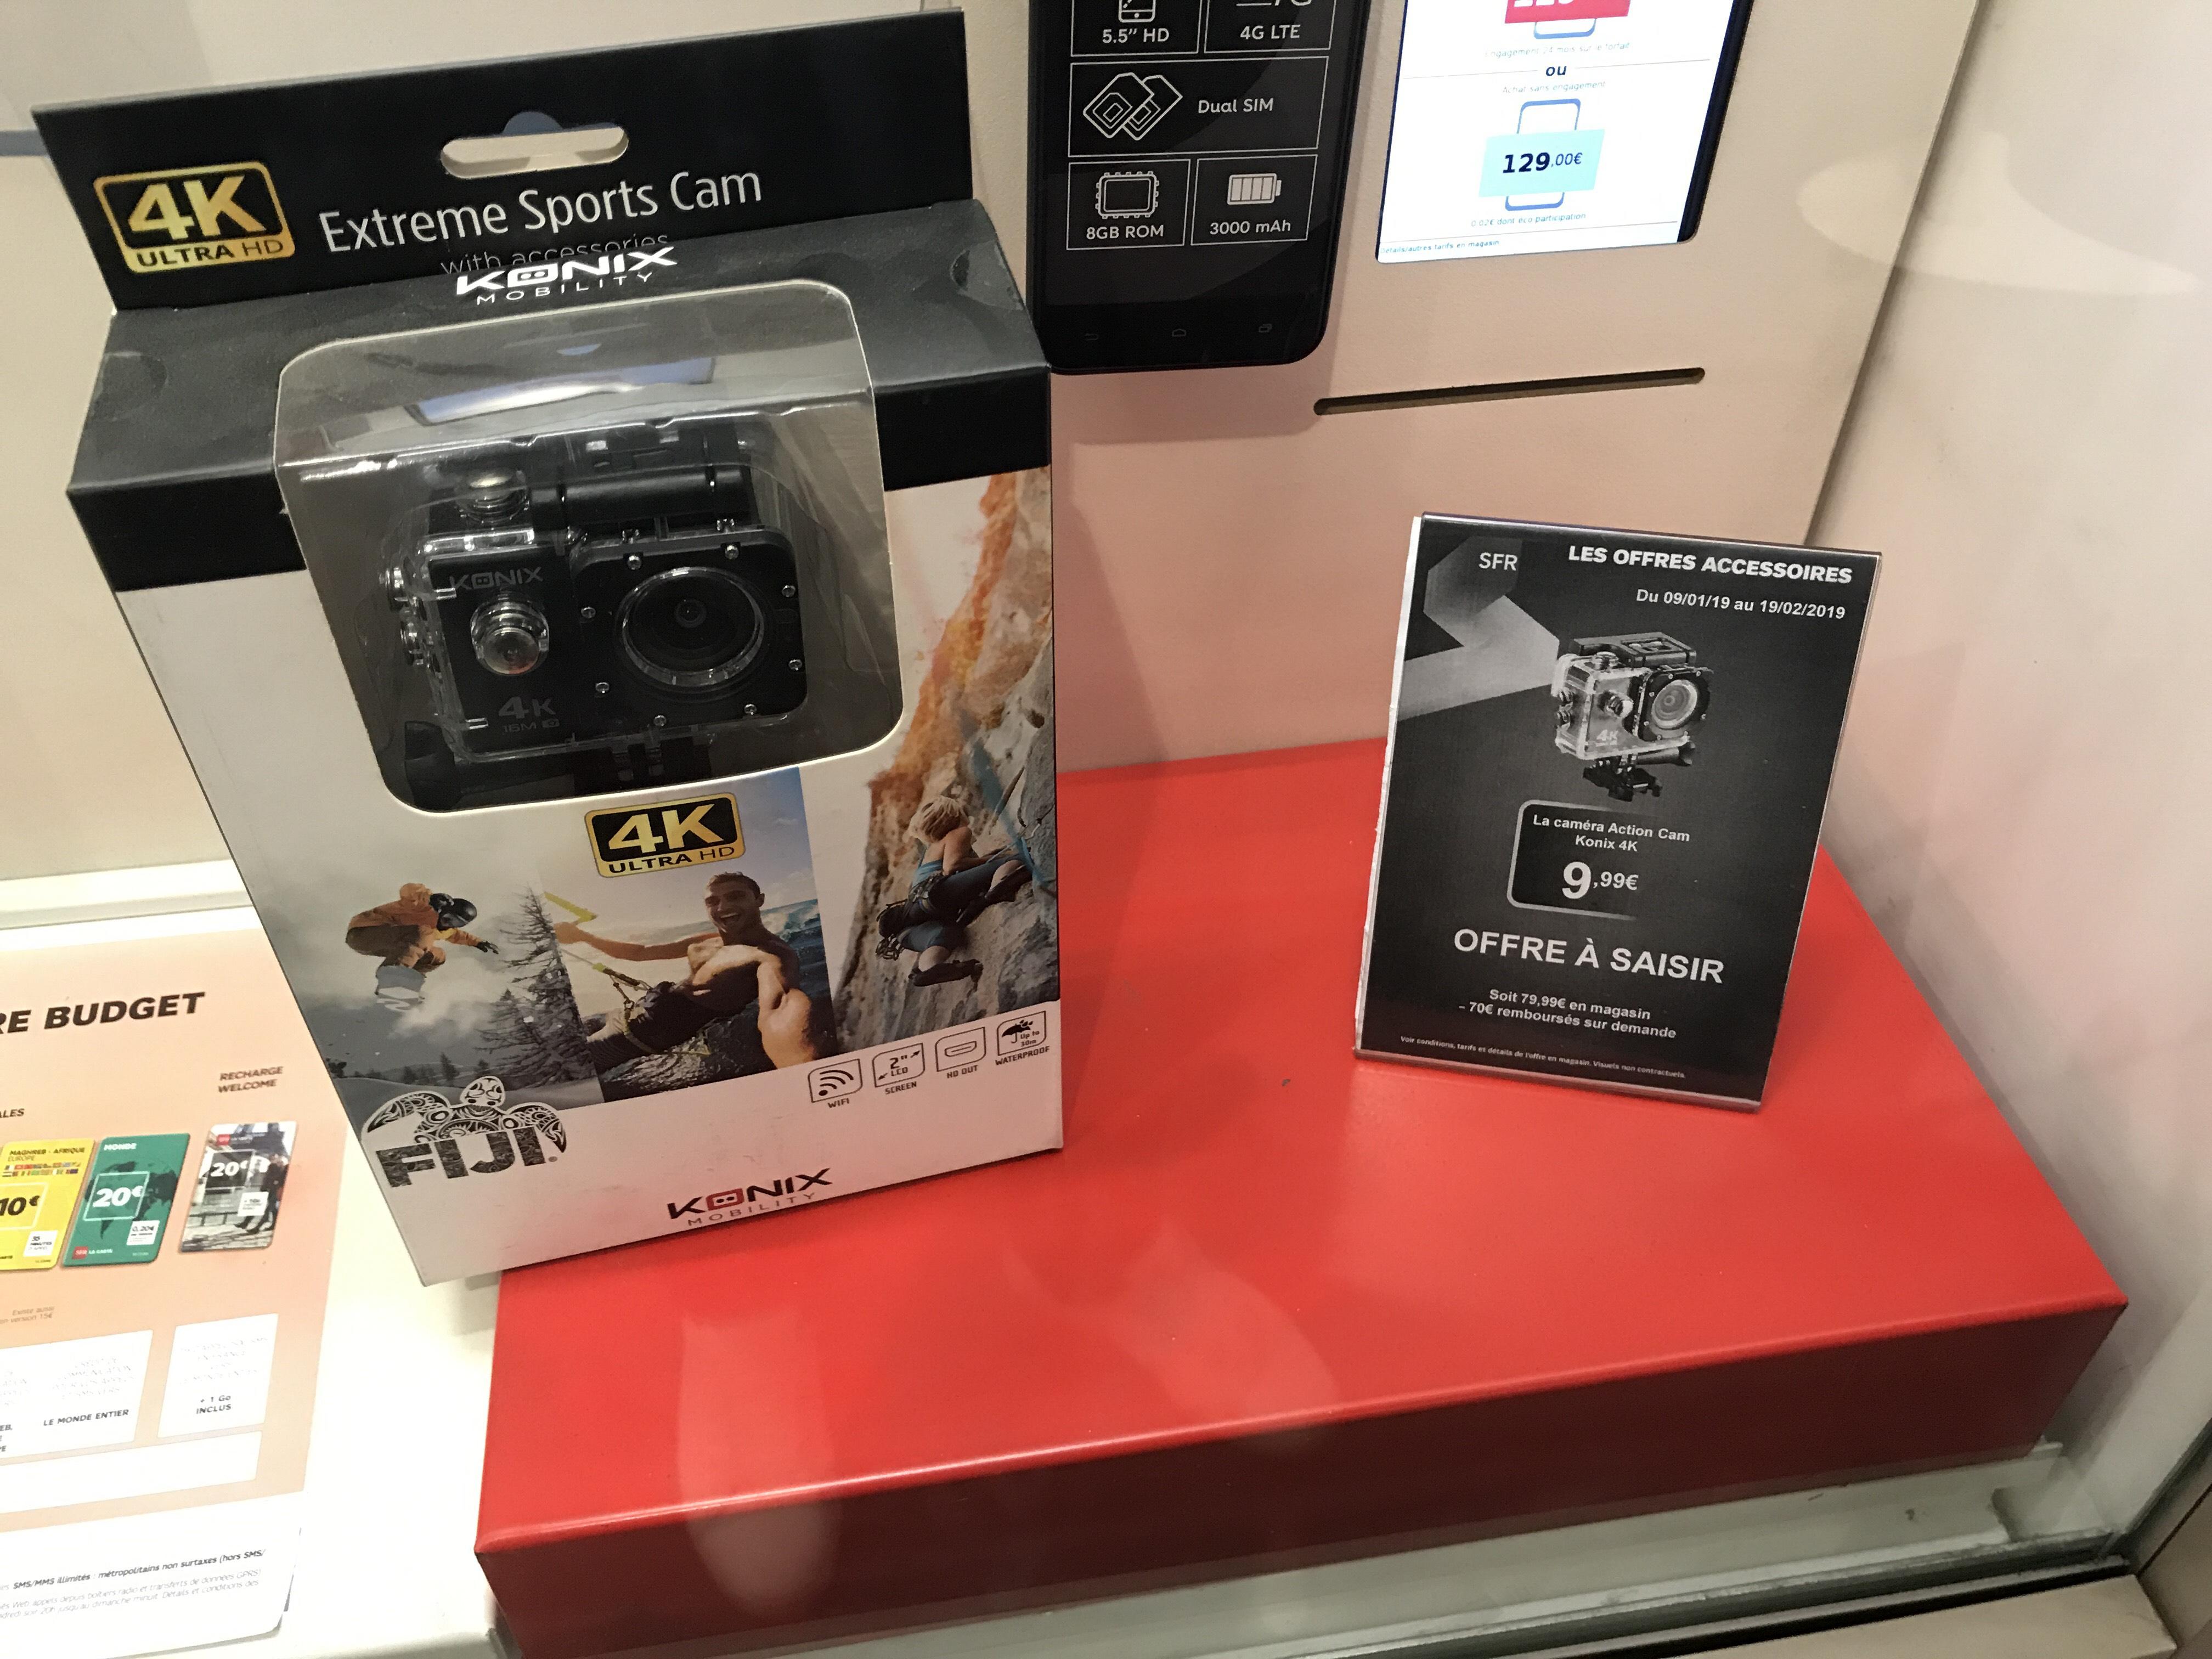 Caméra action Konix 4k (via ODR de 70€) - Bagnolet (93)